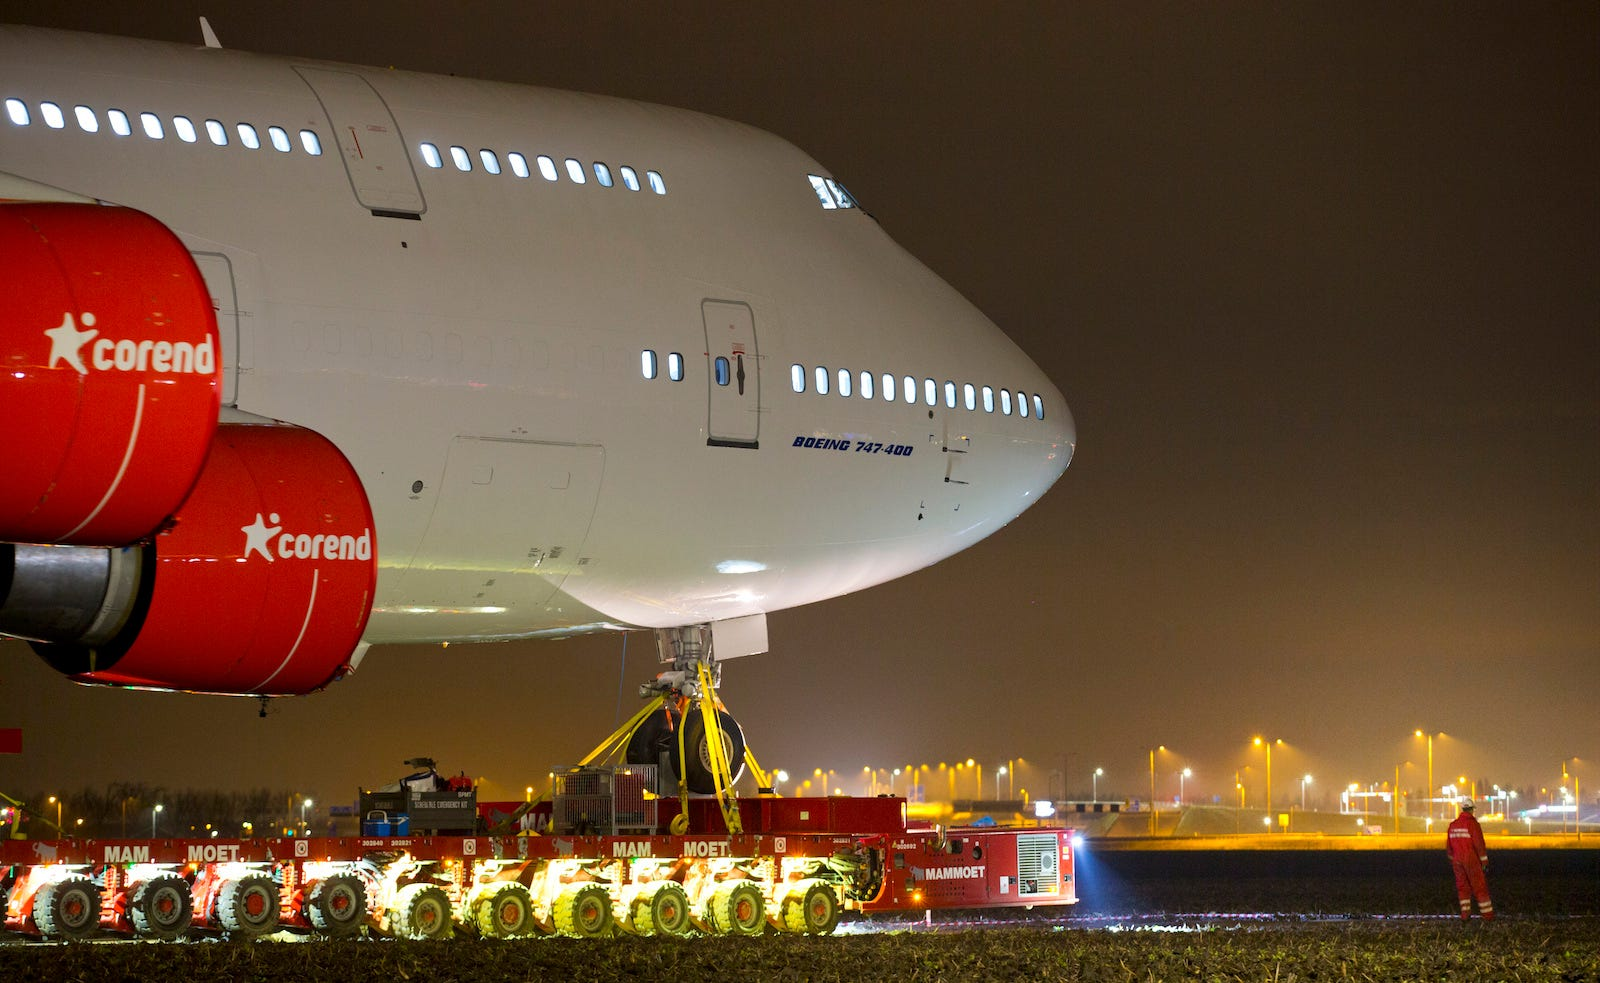 Illustration for article titled Así se traslada un Boeing 747 de 70 metros y 400 toneladas por carreteraem/em